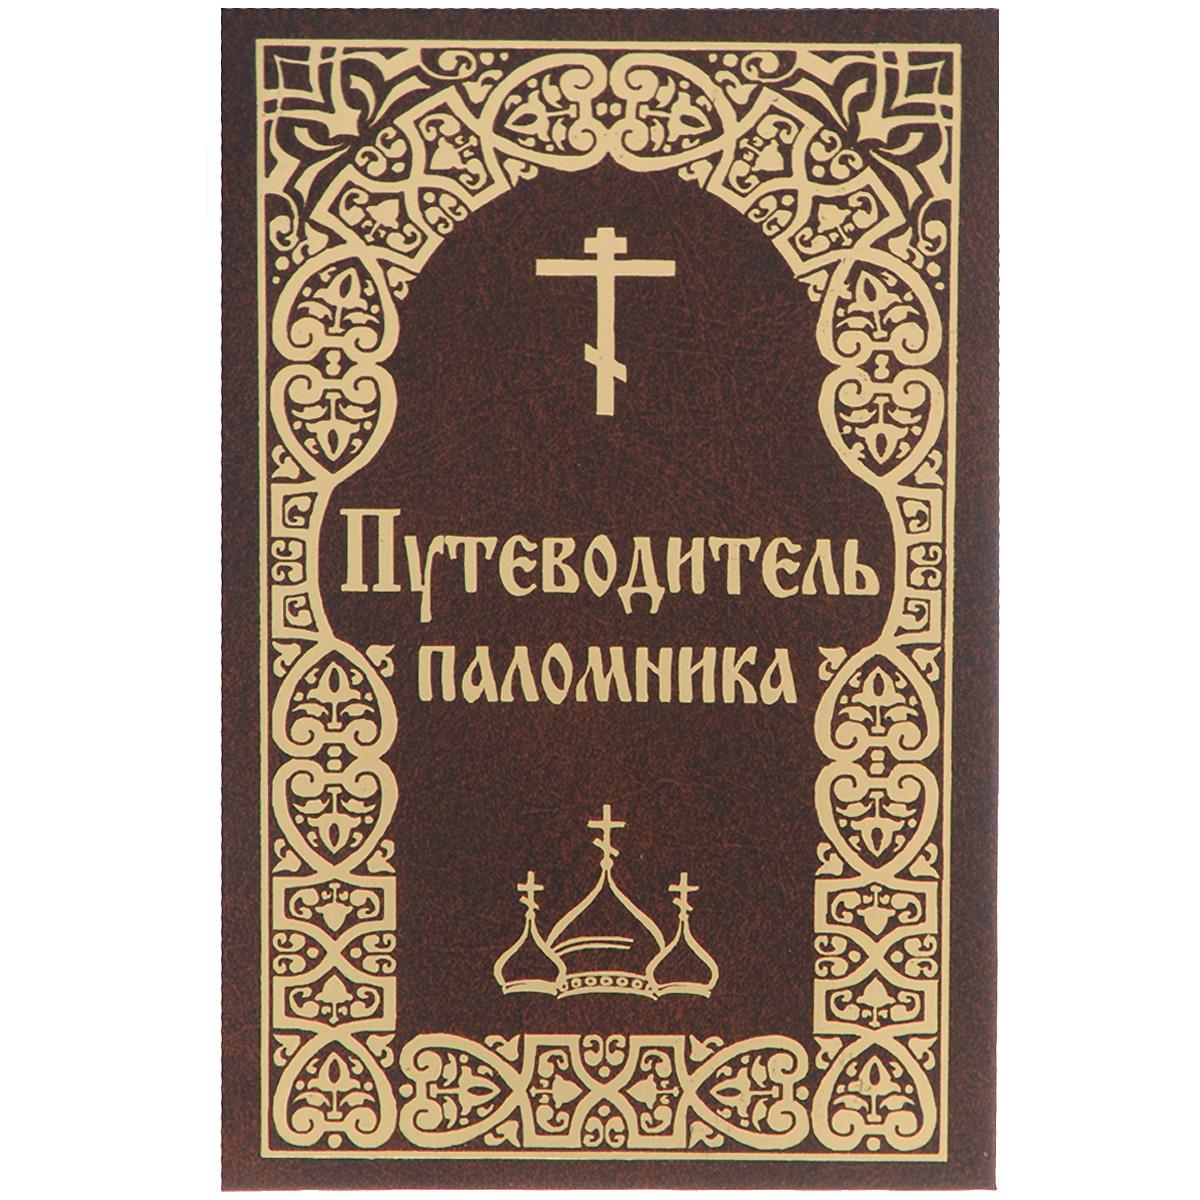 Путеводитель паломника ( 978-5-93288-003-6 )